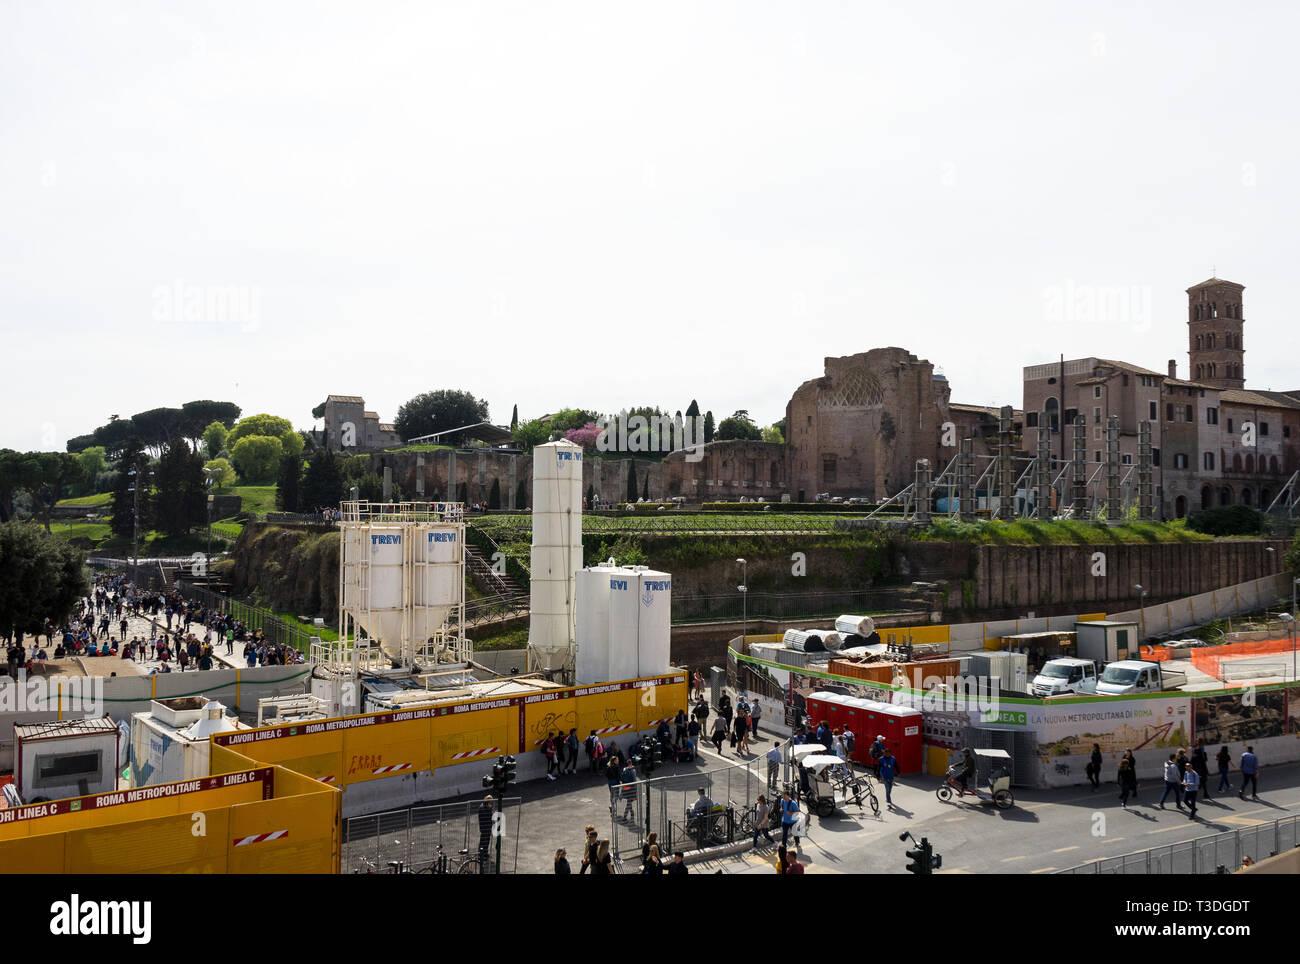 Colosseum, Rome, Italy 04/06/2019: new metro line c building, Fori Imperiali Station. In the background Basilica of Santa Francesca Romana - Stock Image